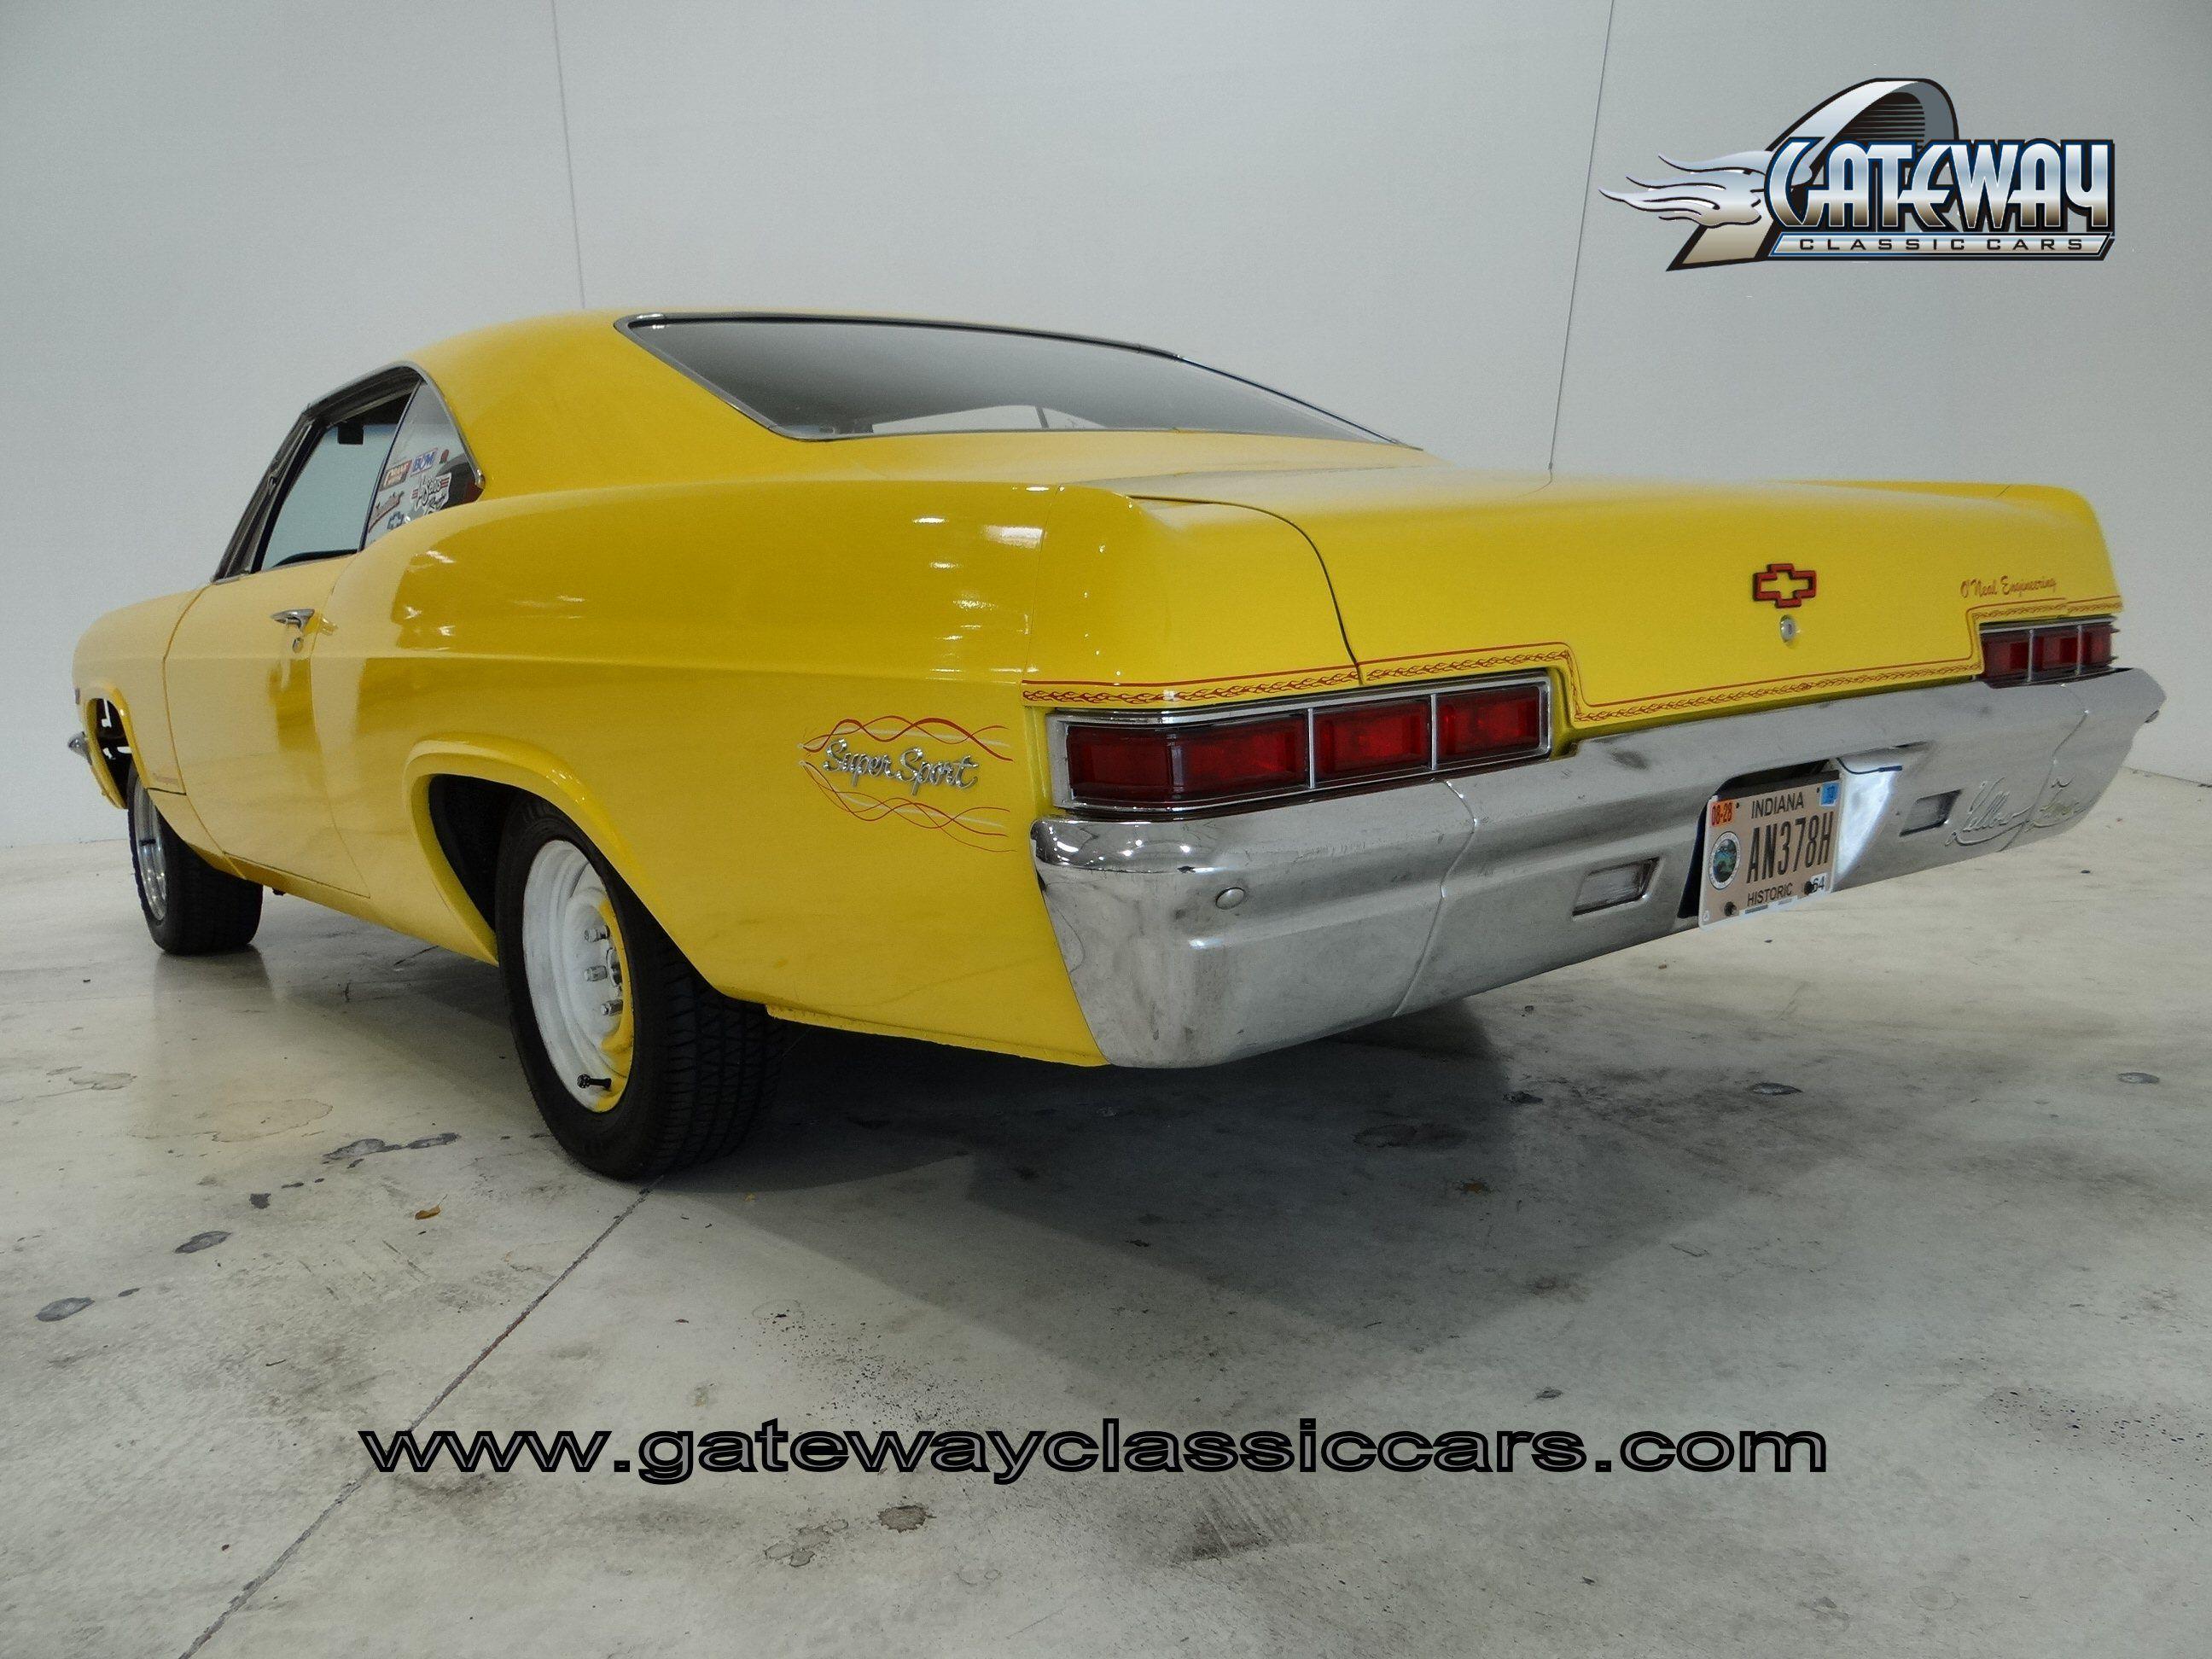 1966 Impala SS for Sale | 1966 Chevrolet Impala Super Sport Clone ...